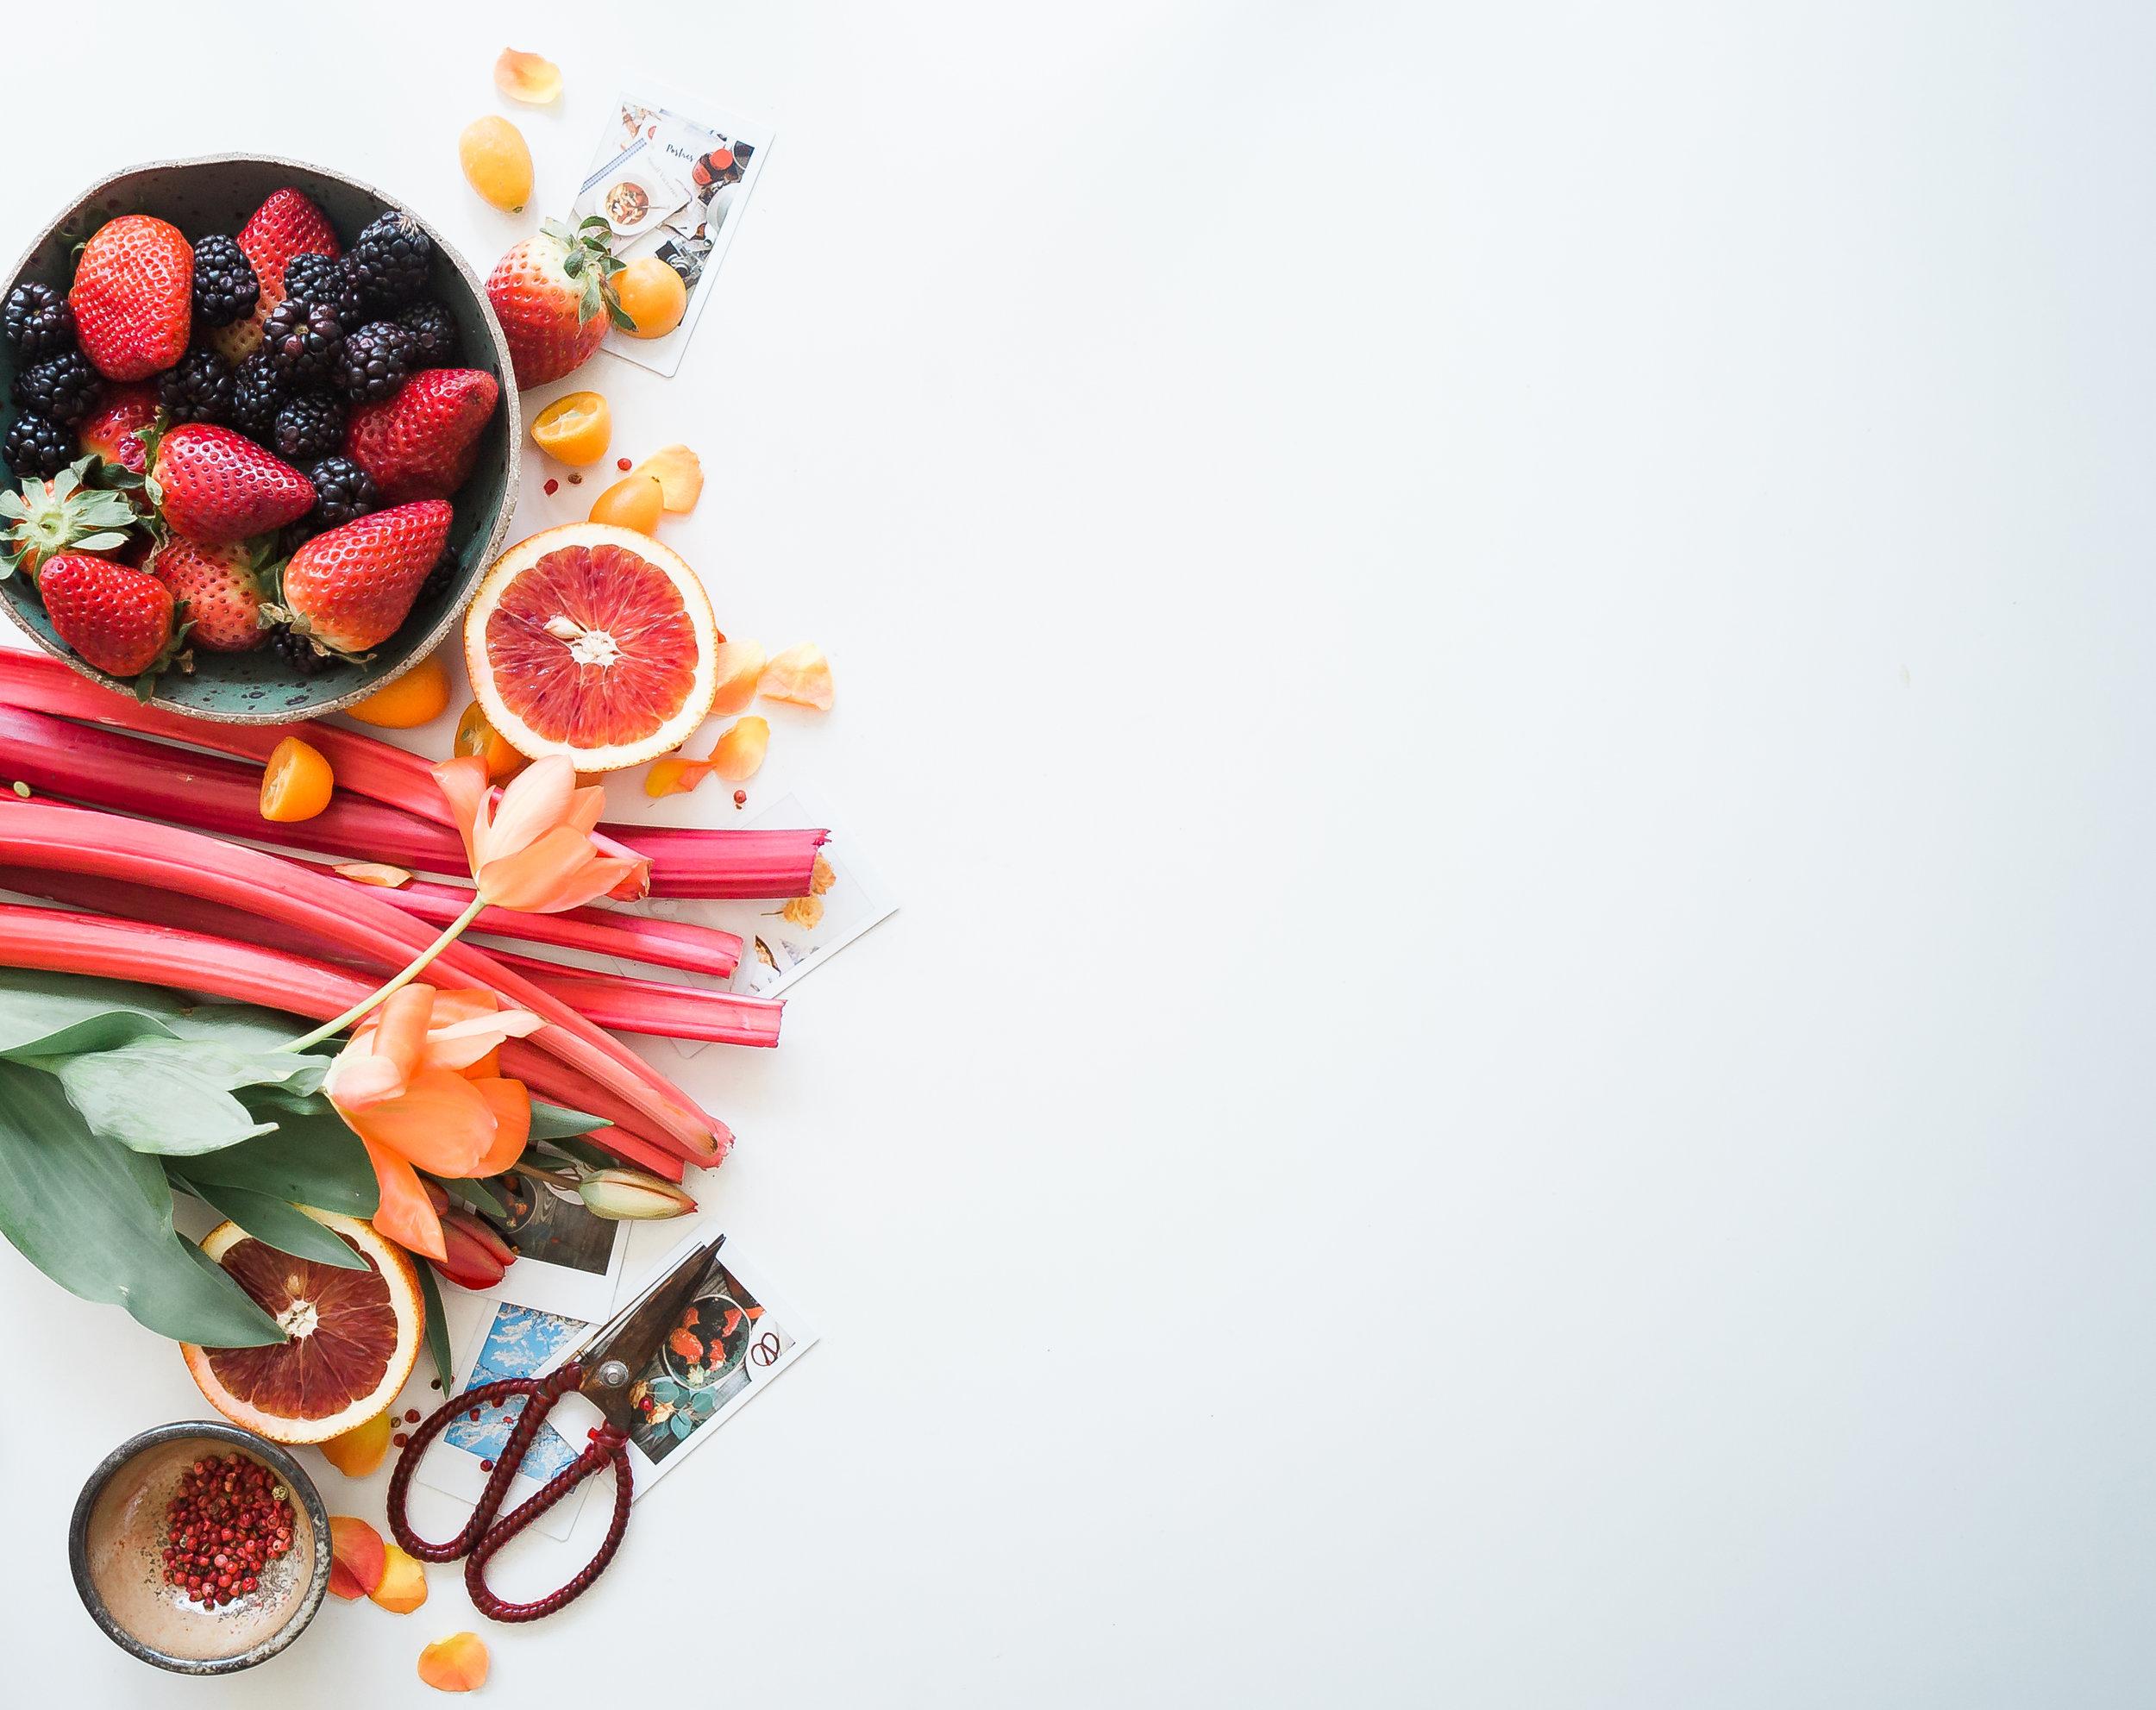 *Foodwelten - So nennen wir bei foodward alle Innovationsvorhaben inkl. relevanter Stories – ob off- oder online, ob POS oder POC ob Lebensmittel oder Getränk.